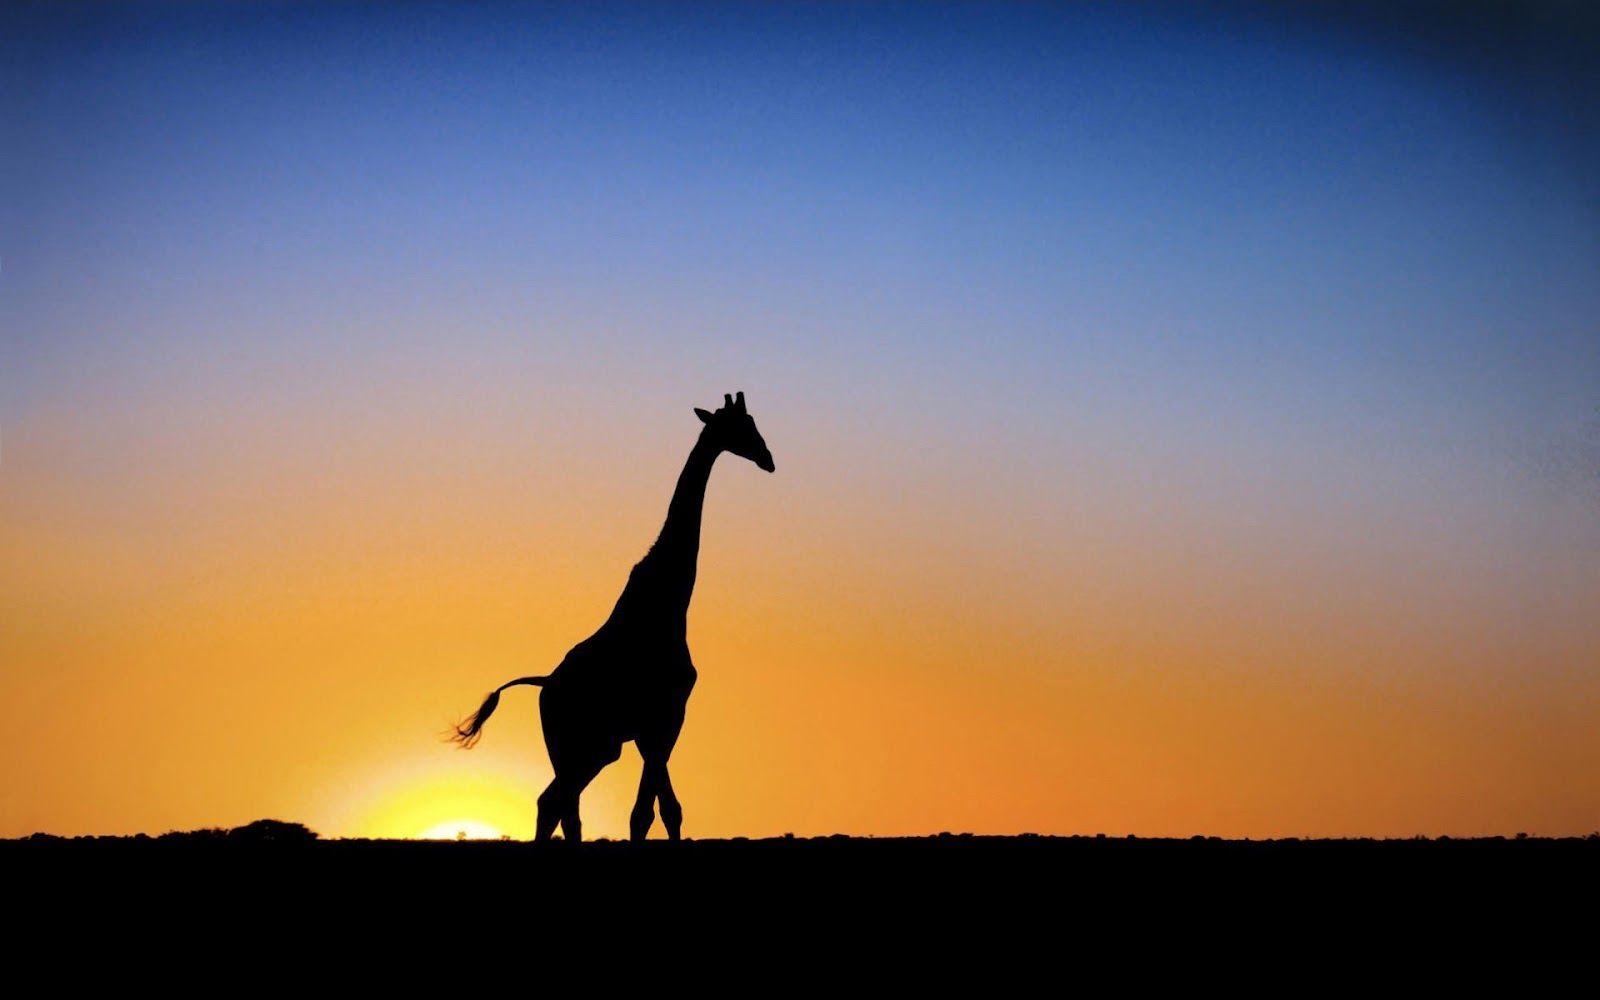 Pin By Setayesh Asgari On Silhouettes Giraffe Pictures Giraffe Images Giraffe